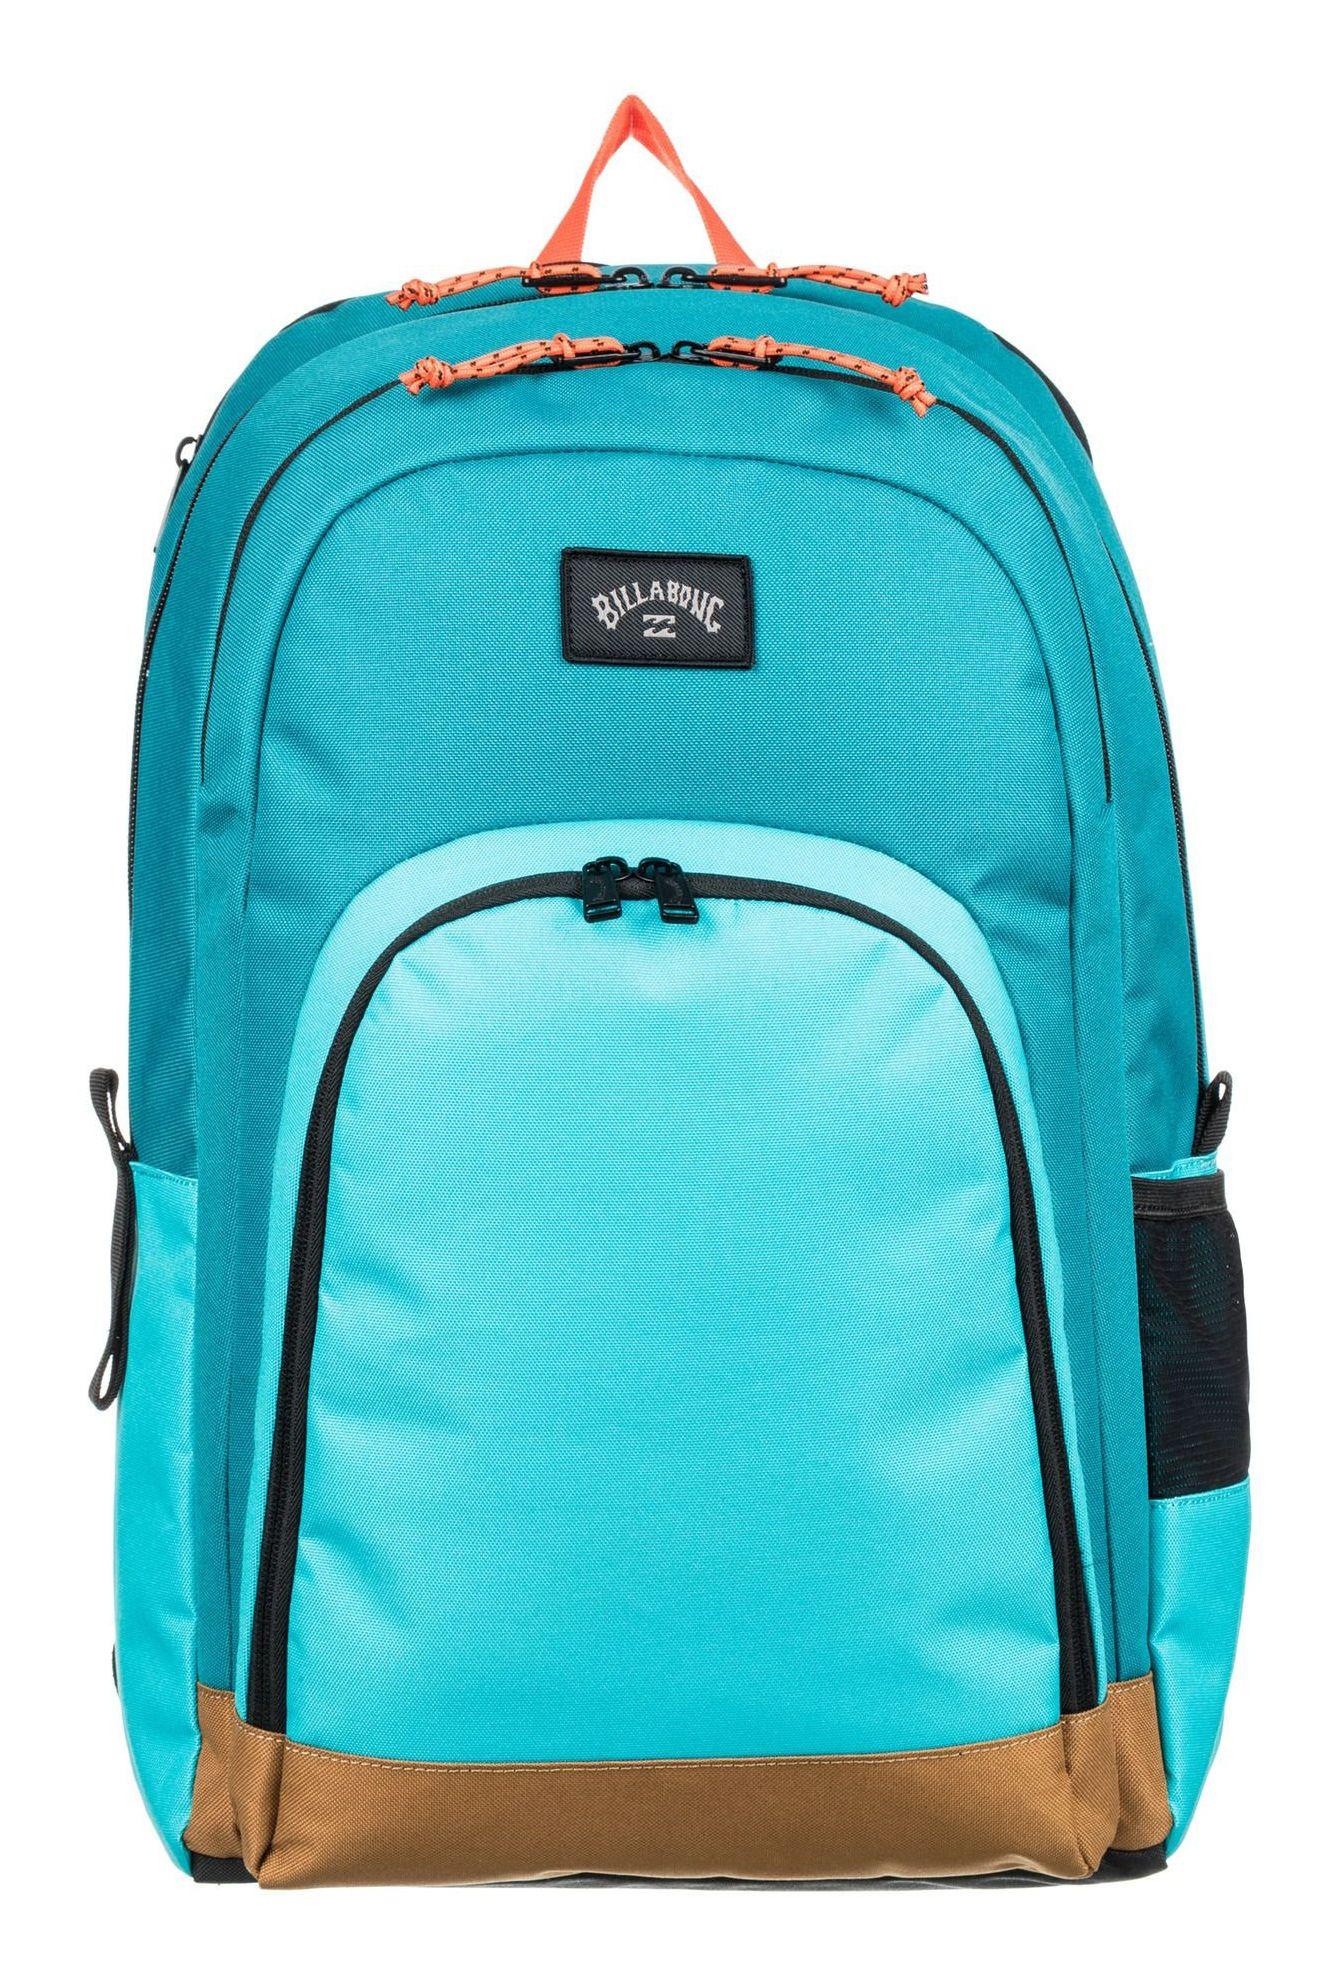 Billabong Backpack COMMAND PACK Teal